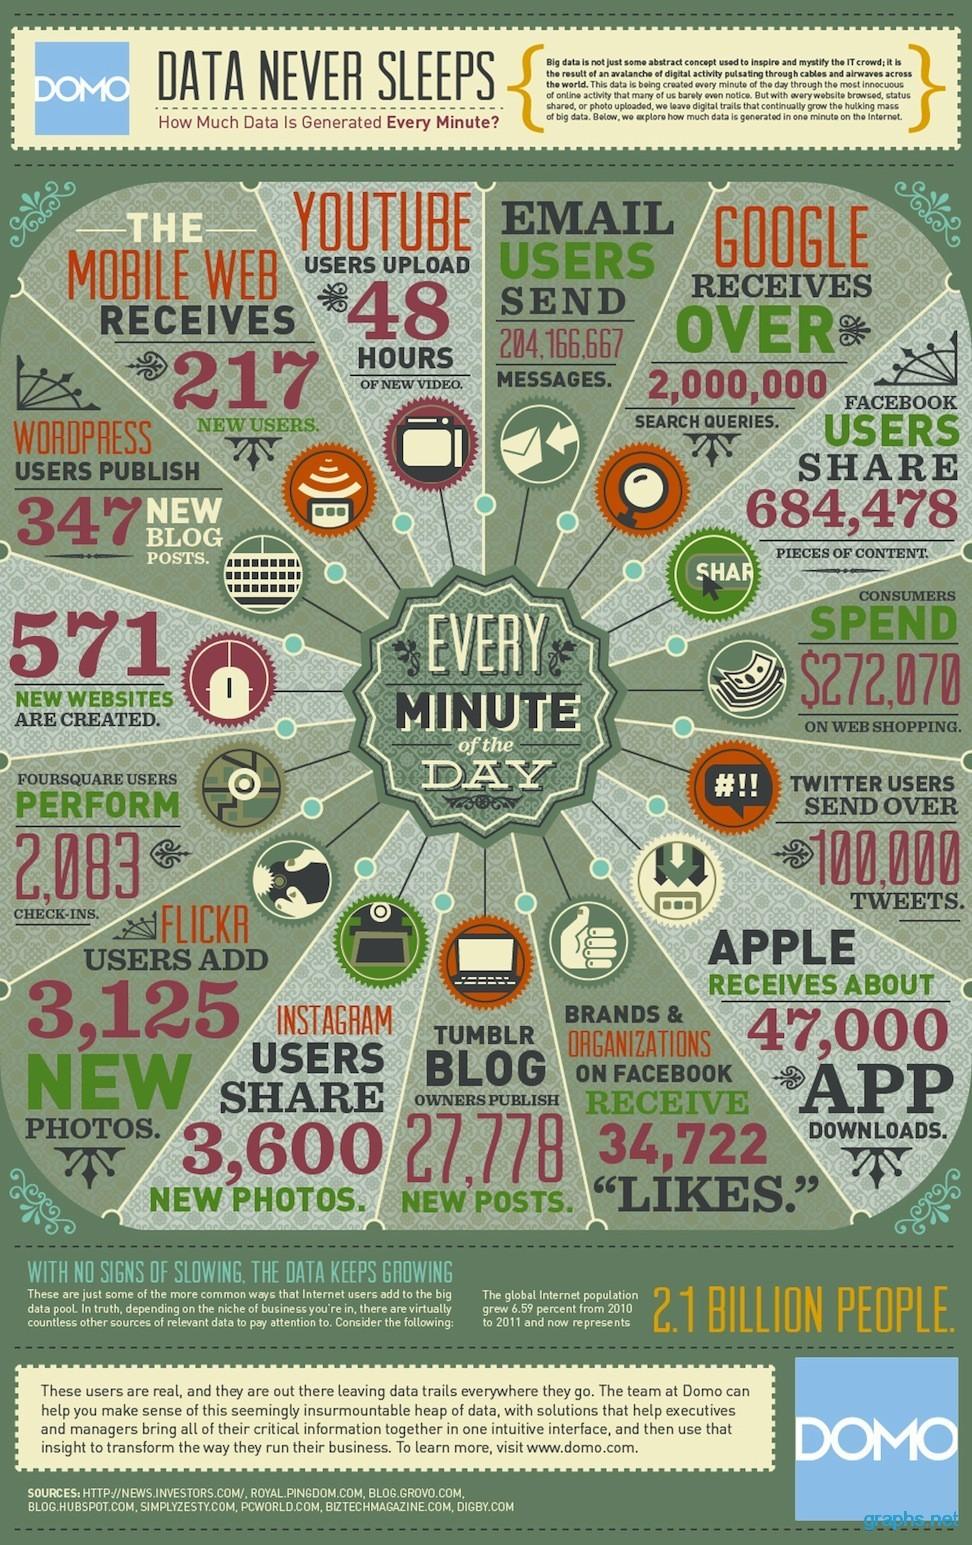 Generation of Data Per Minute